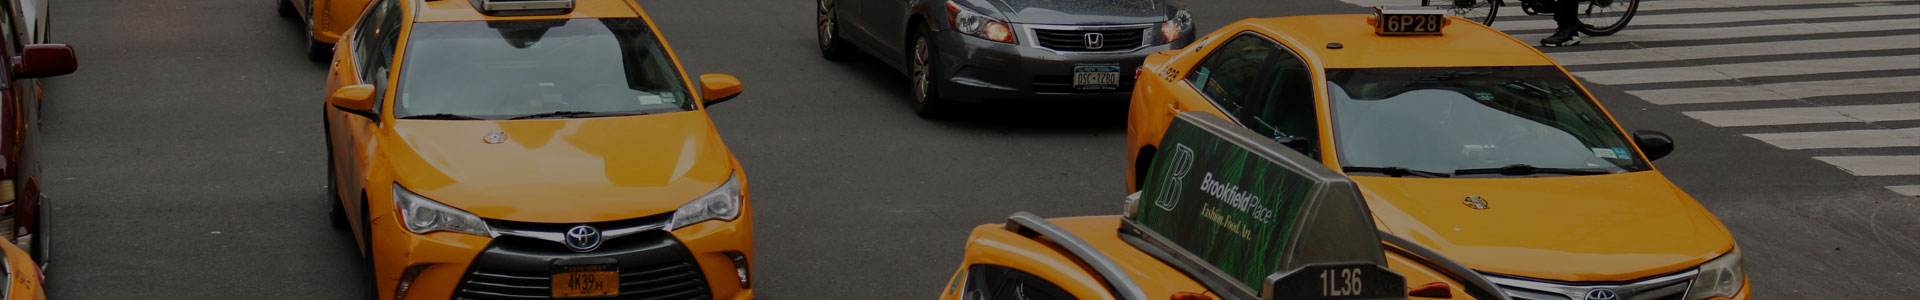 Uber Clone Script | Uber Clone App | Taxi Booking Script image 1